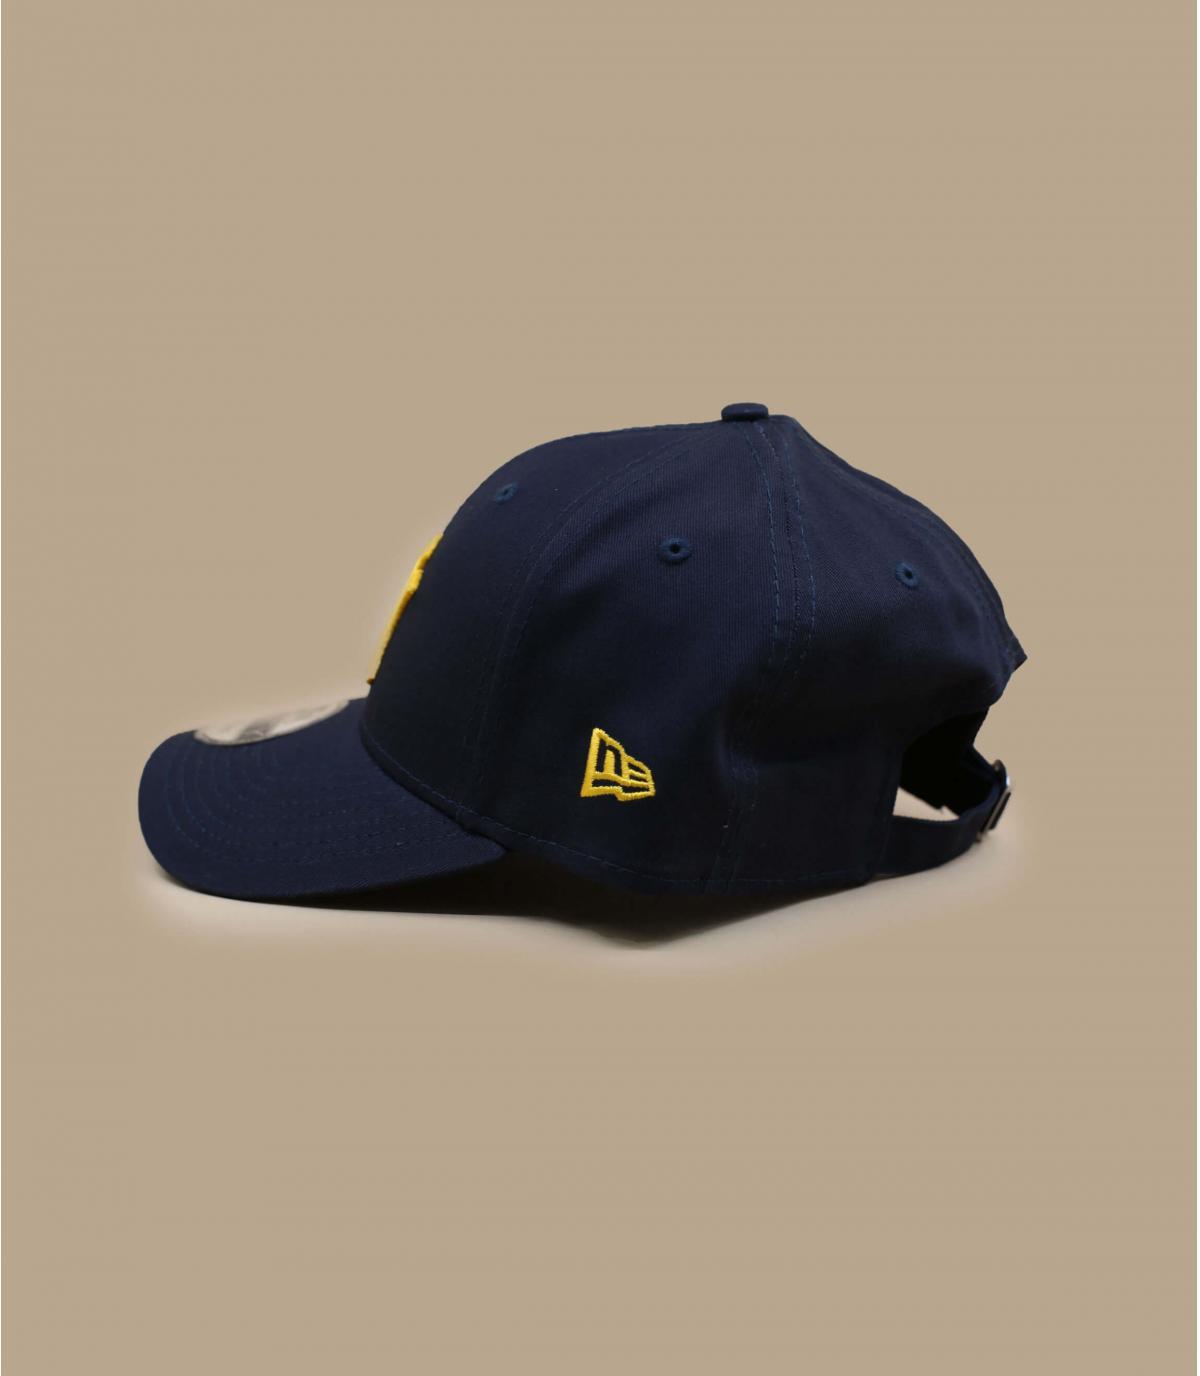 Details League Ess NY 940 navy gold - Abbildung 3